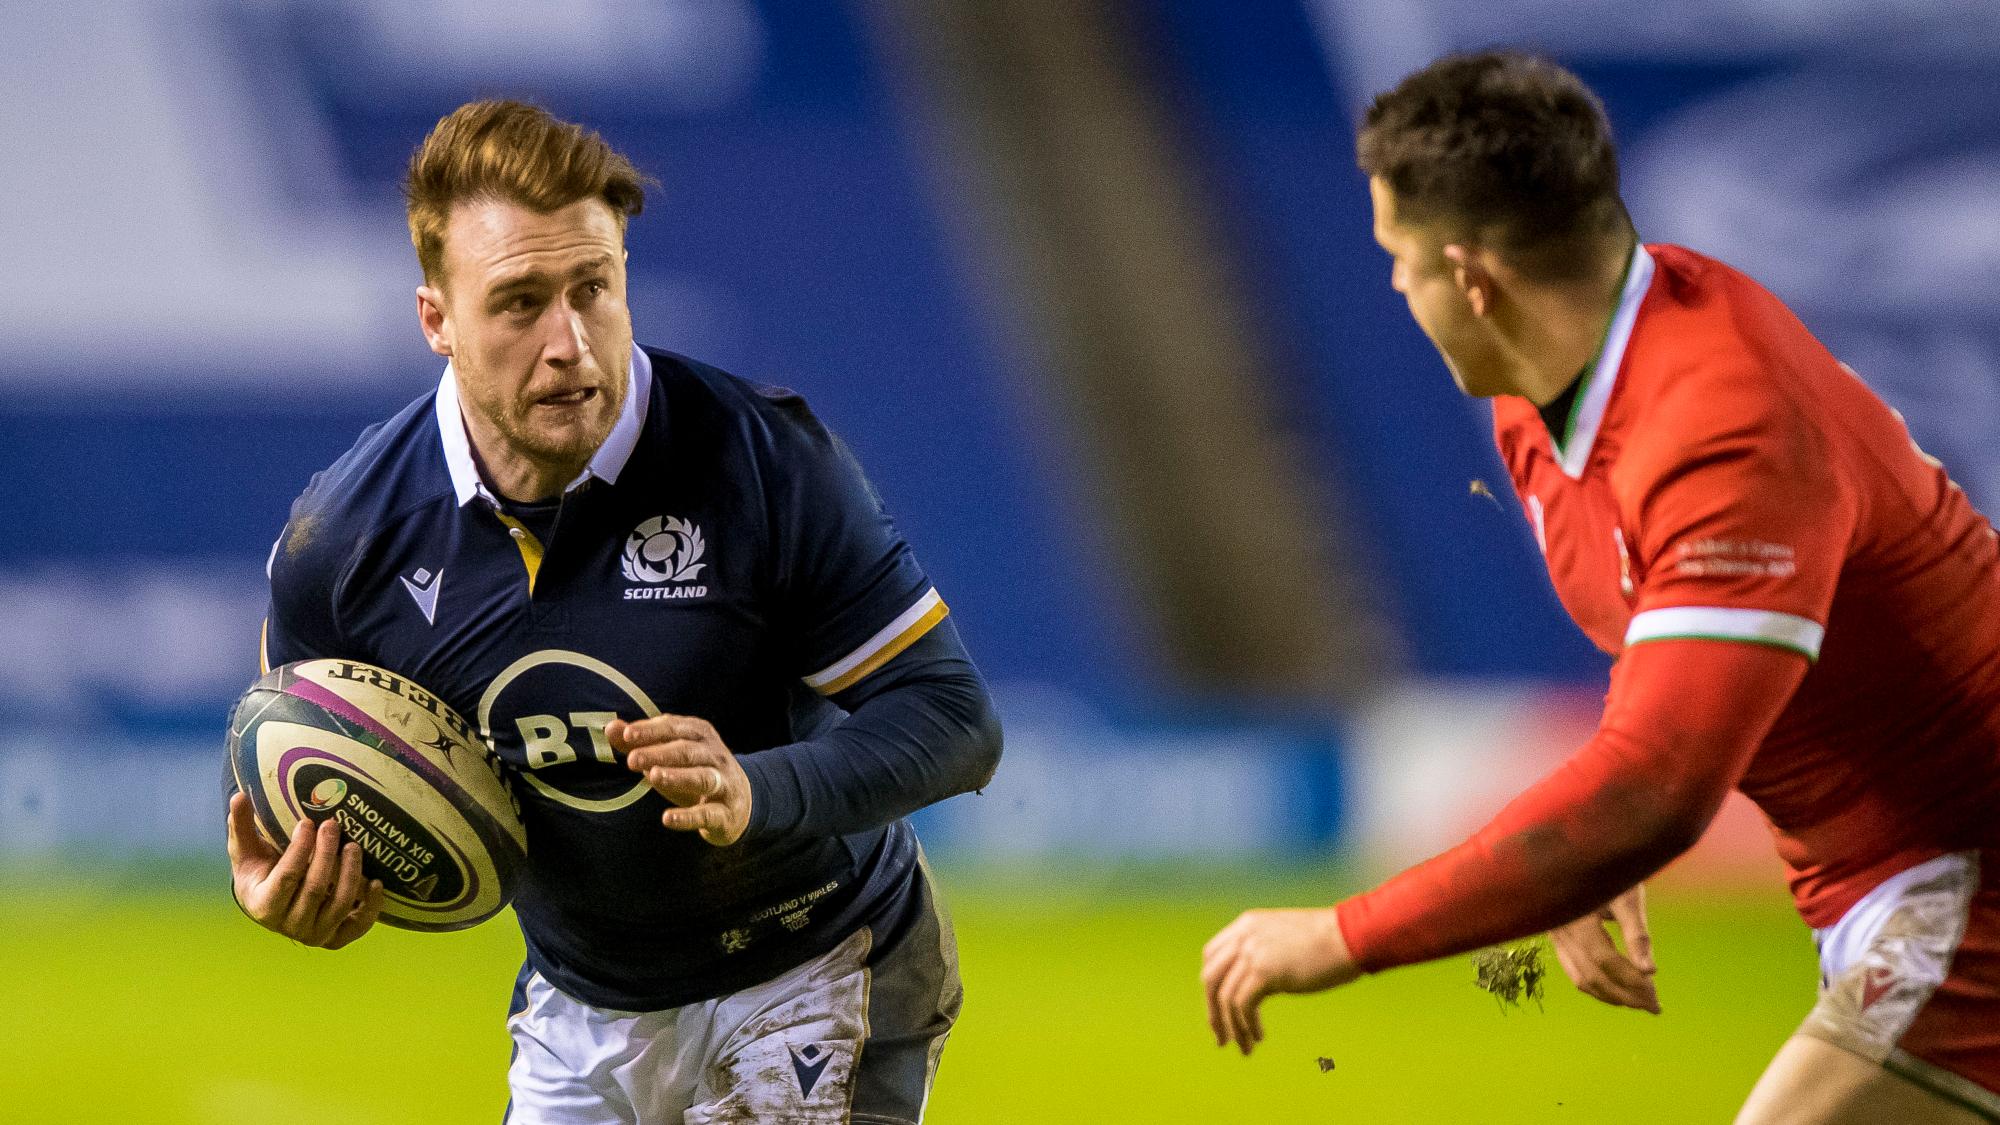 Stuart Hogg Ecosse discipline